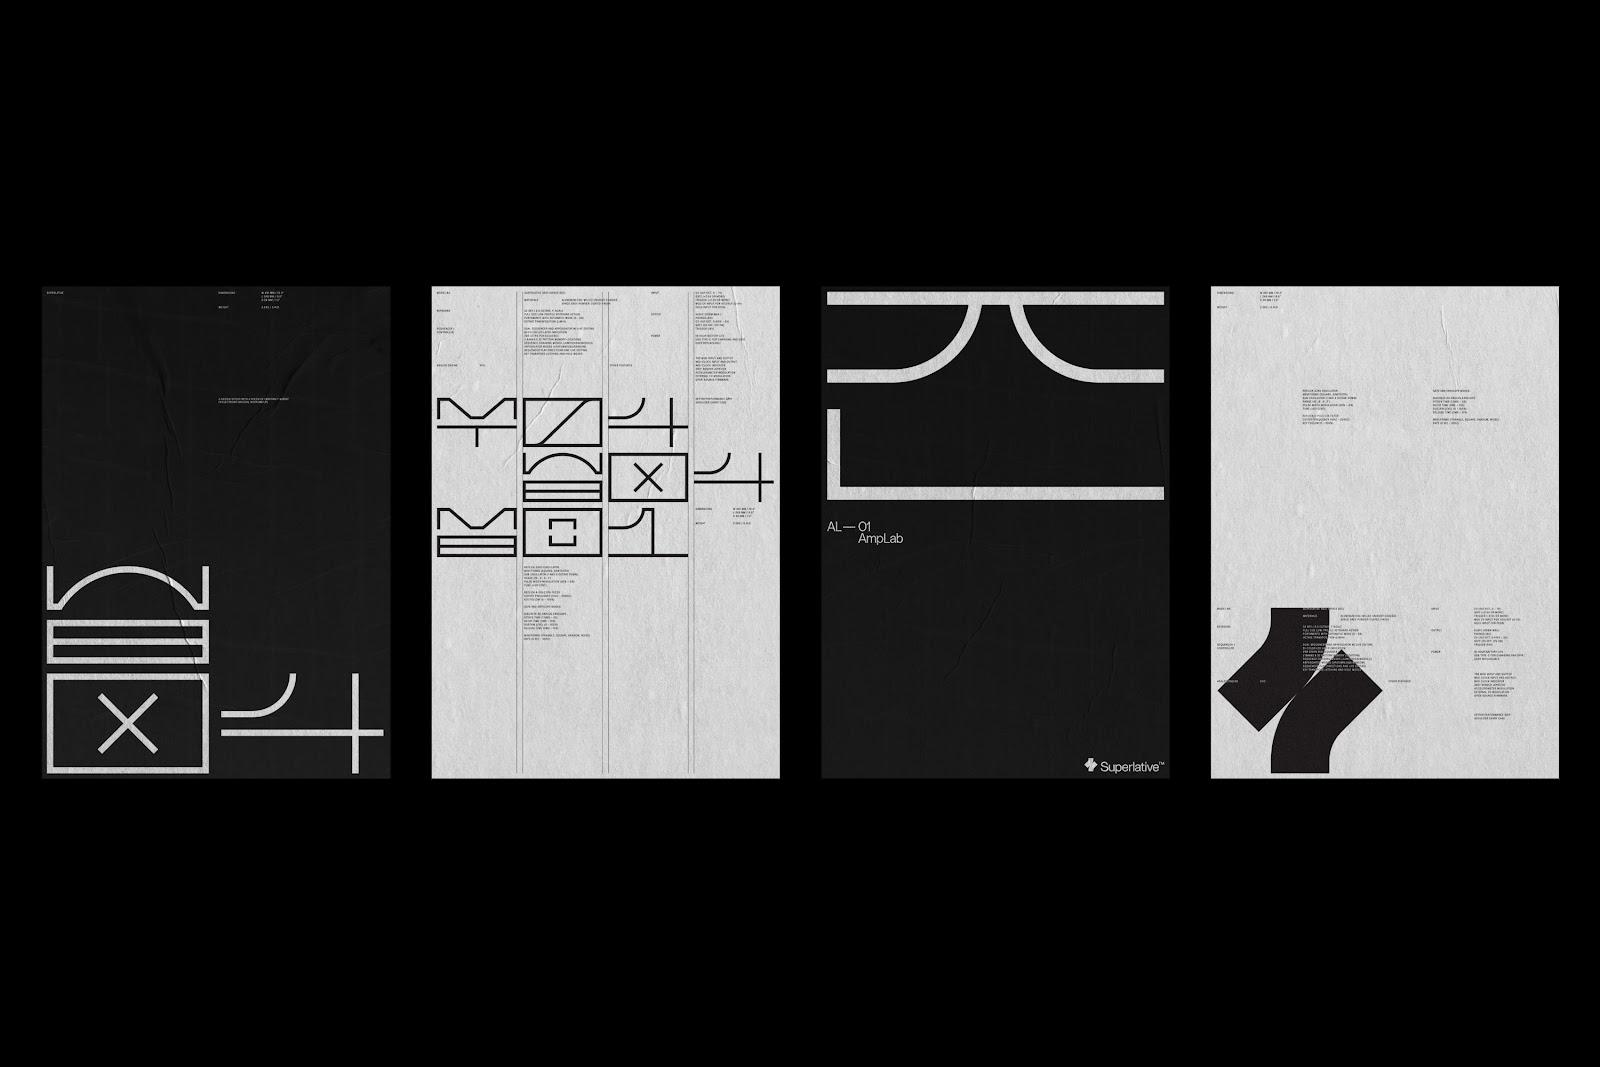 Superlative branding, bespoke hieroglyphs by KurrpaHosk